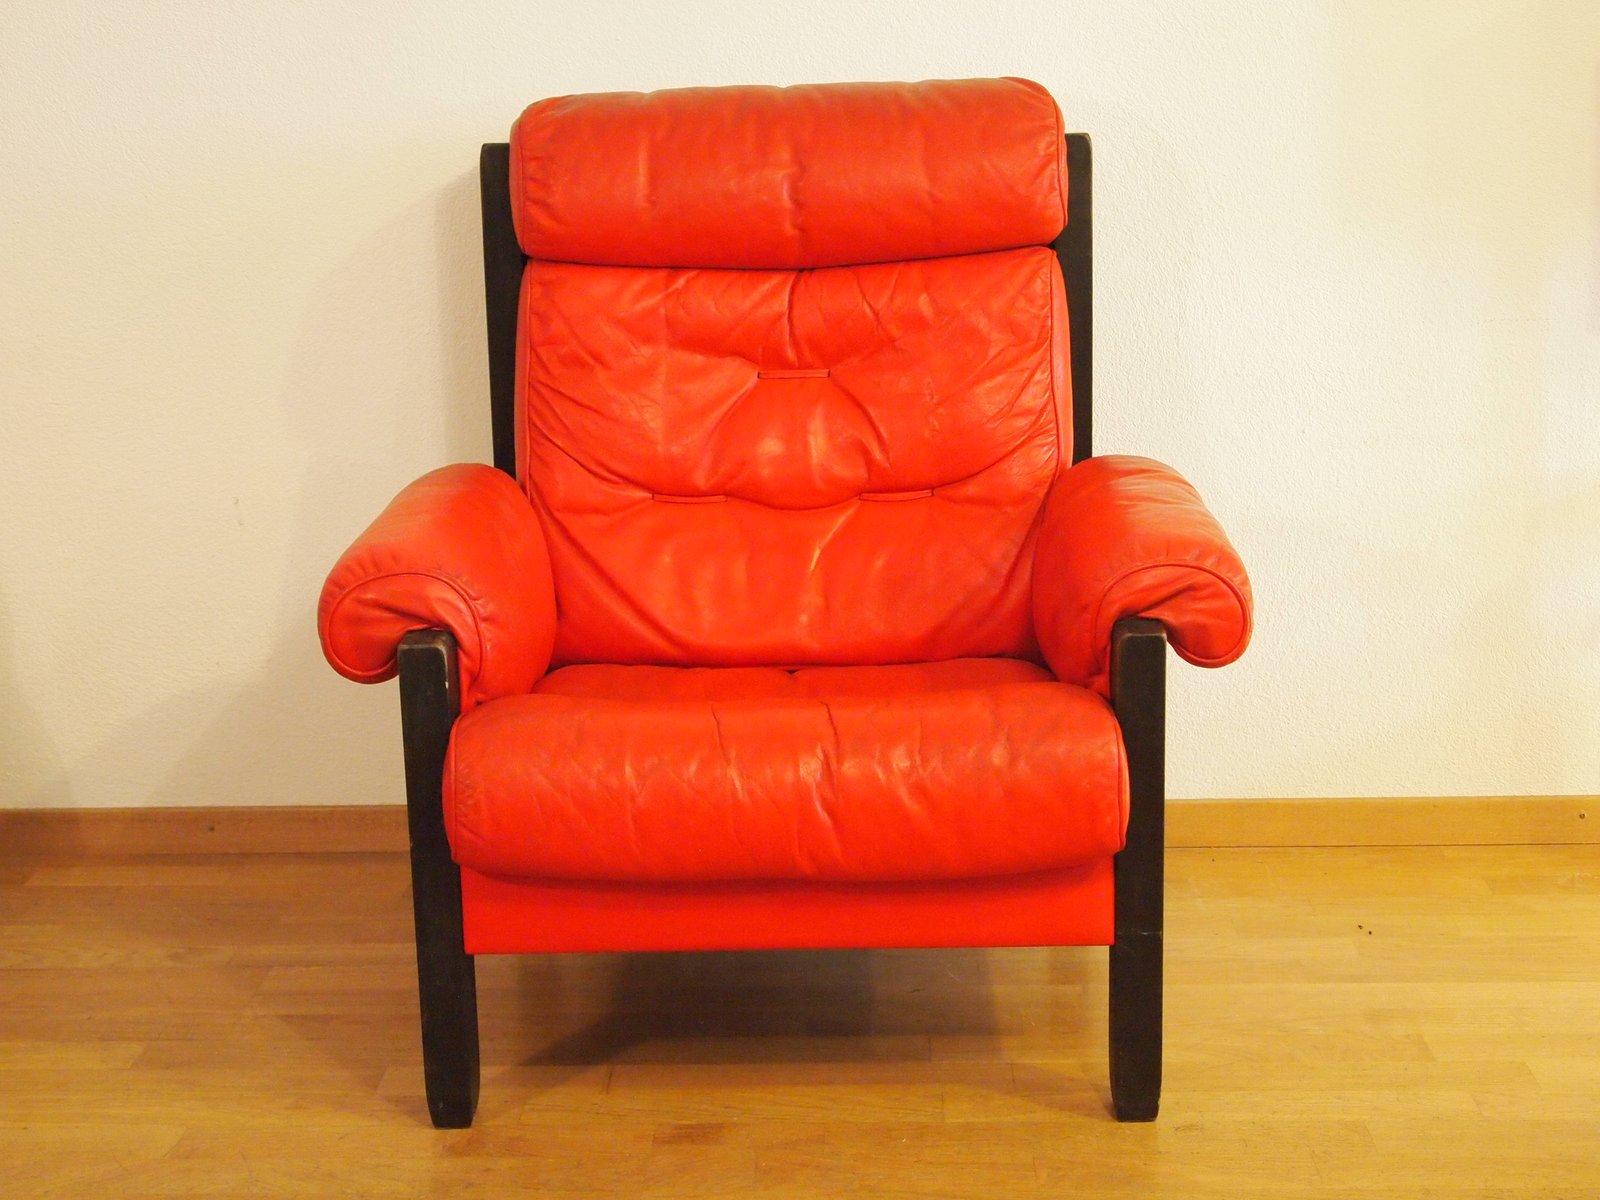 Roter vintage ledersessel von de sede bei pamono kaufen for Roter ledersessel